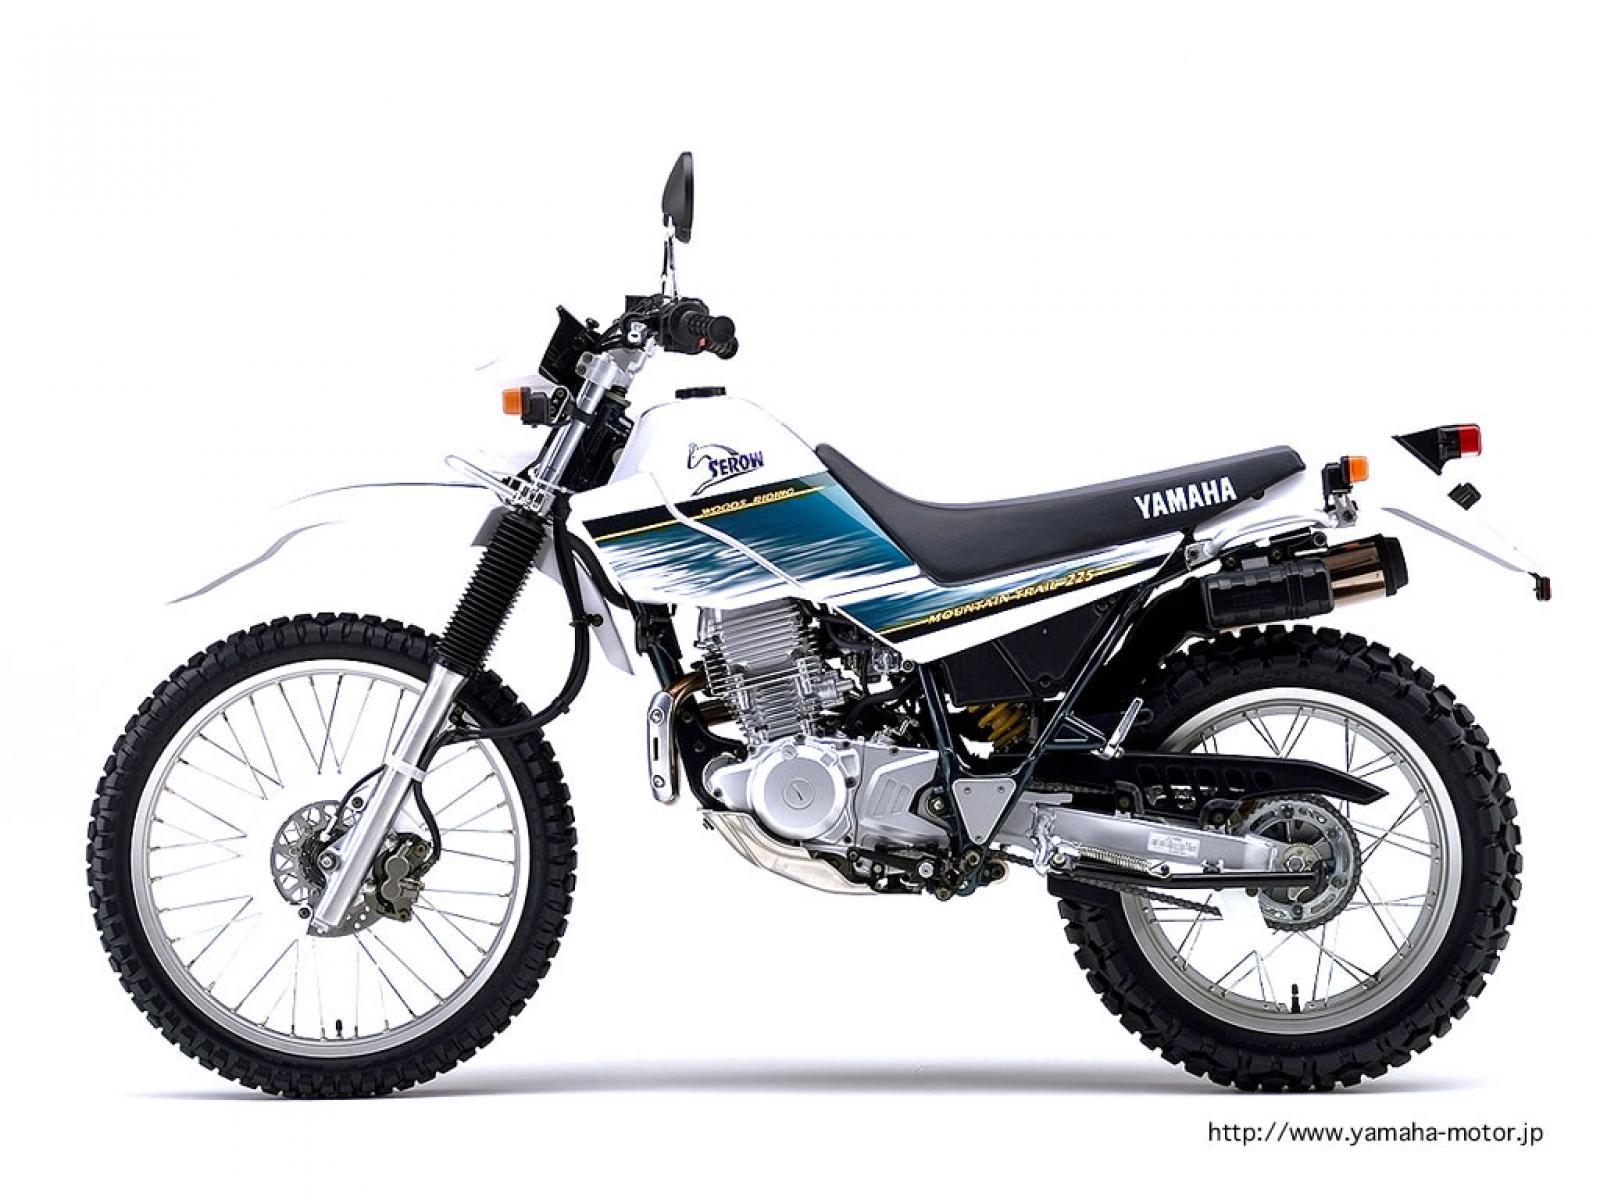 Yamaha Yamaha Serow 225 We